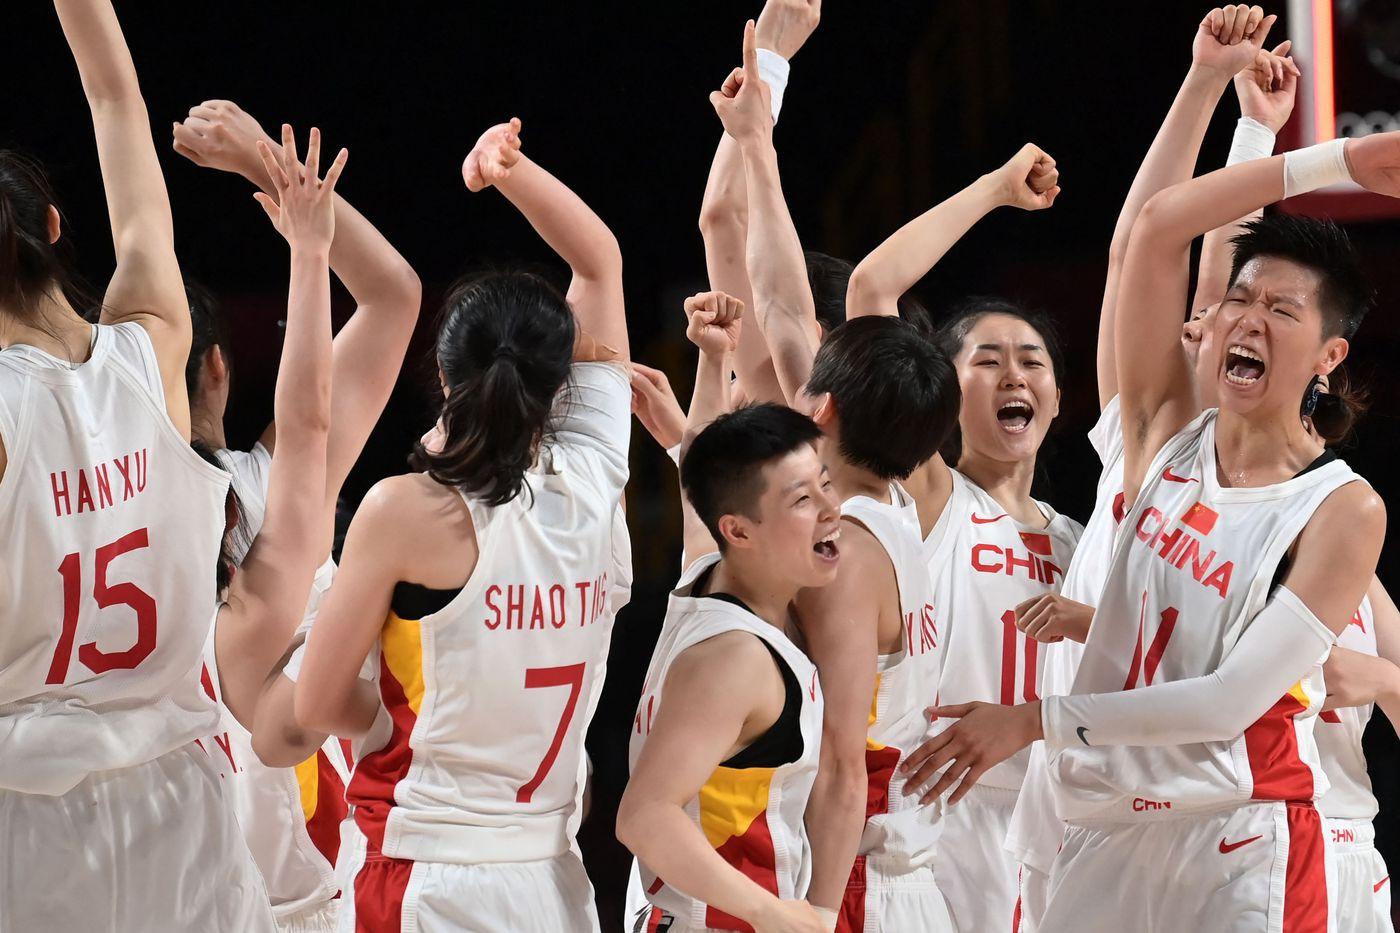 Olympic men's basketball team derrick rose shooting instruction Wxhajovglveqdm